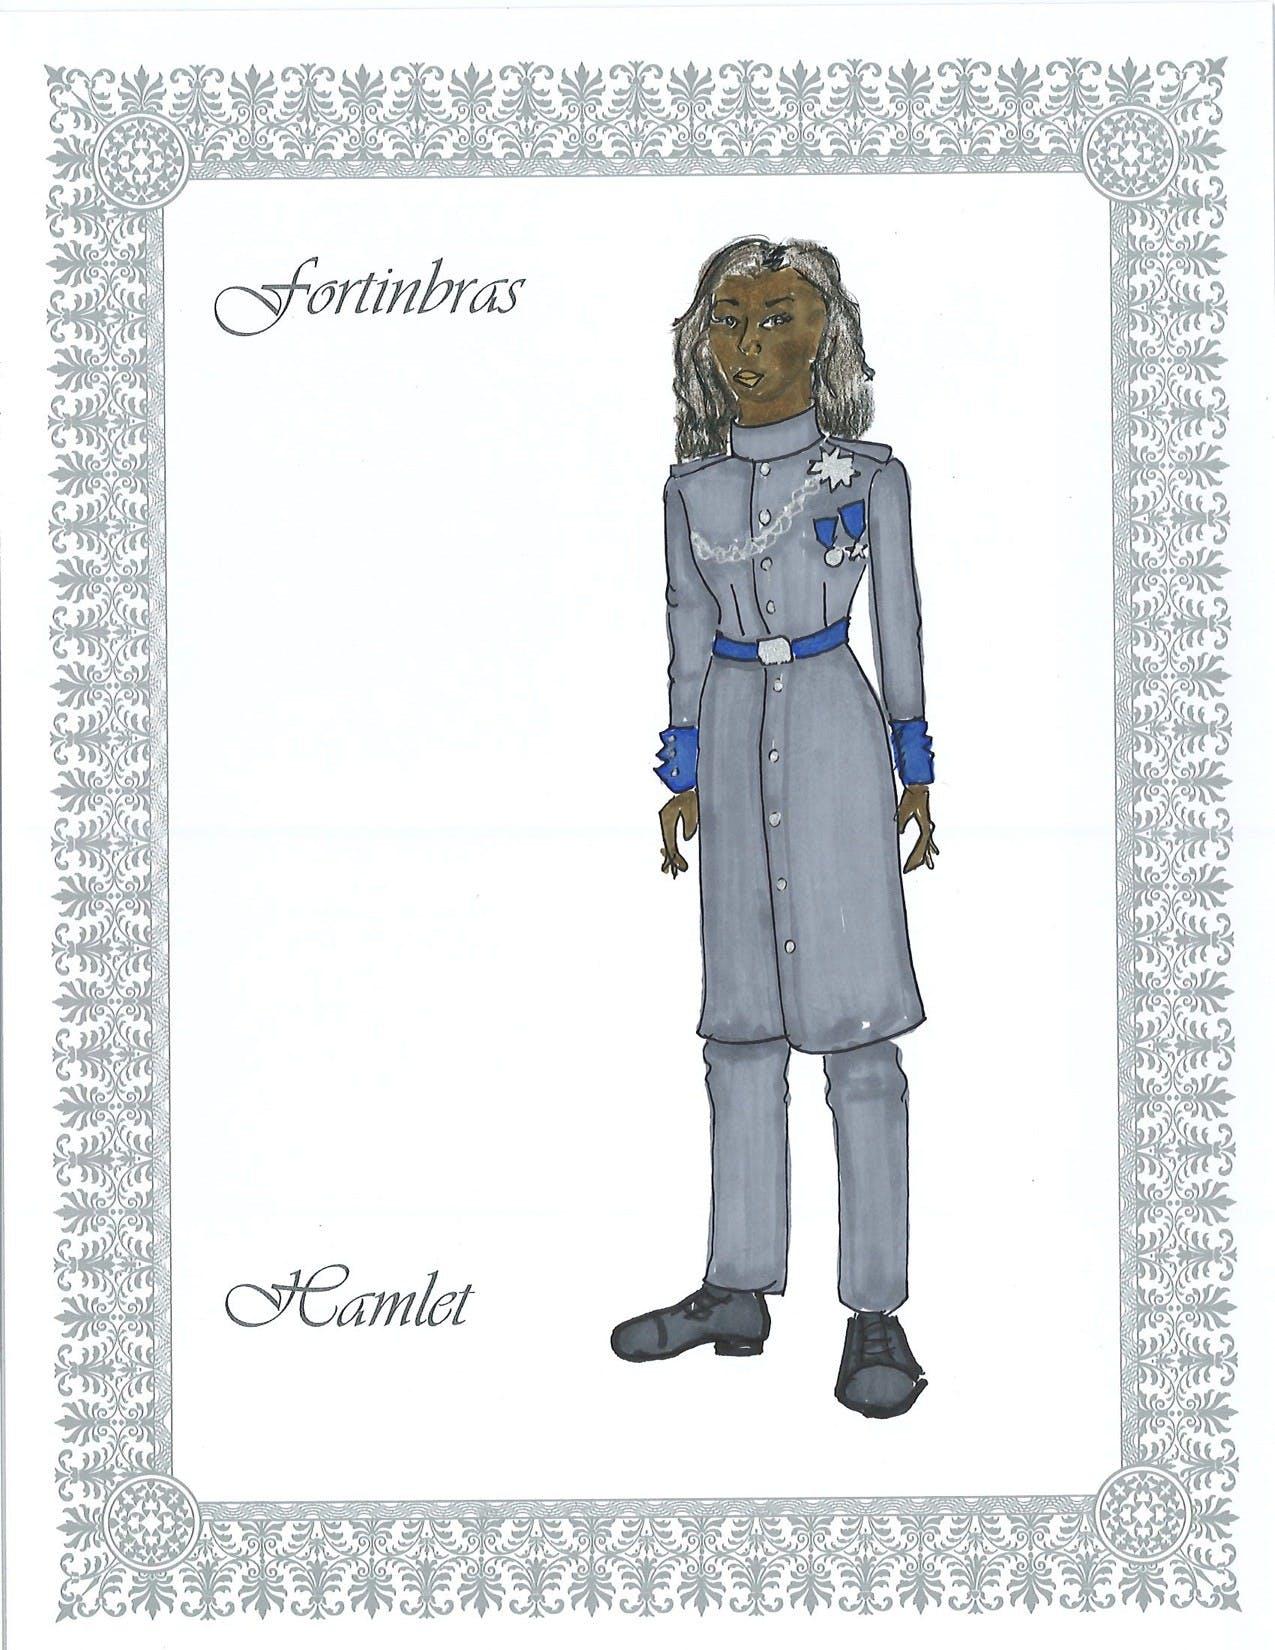 Fortinbras costume design